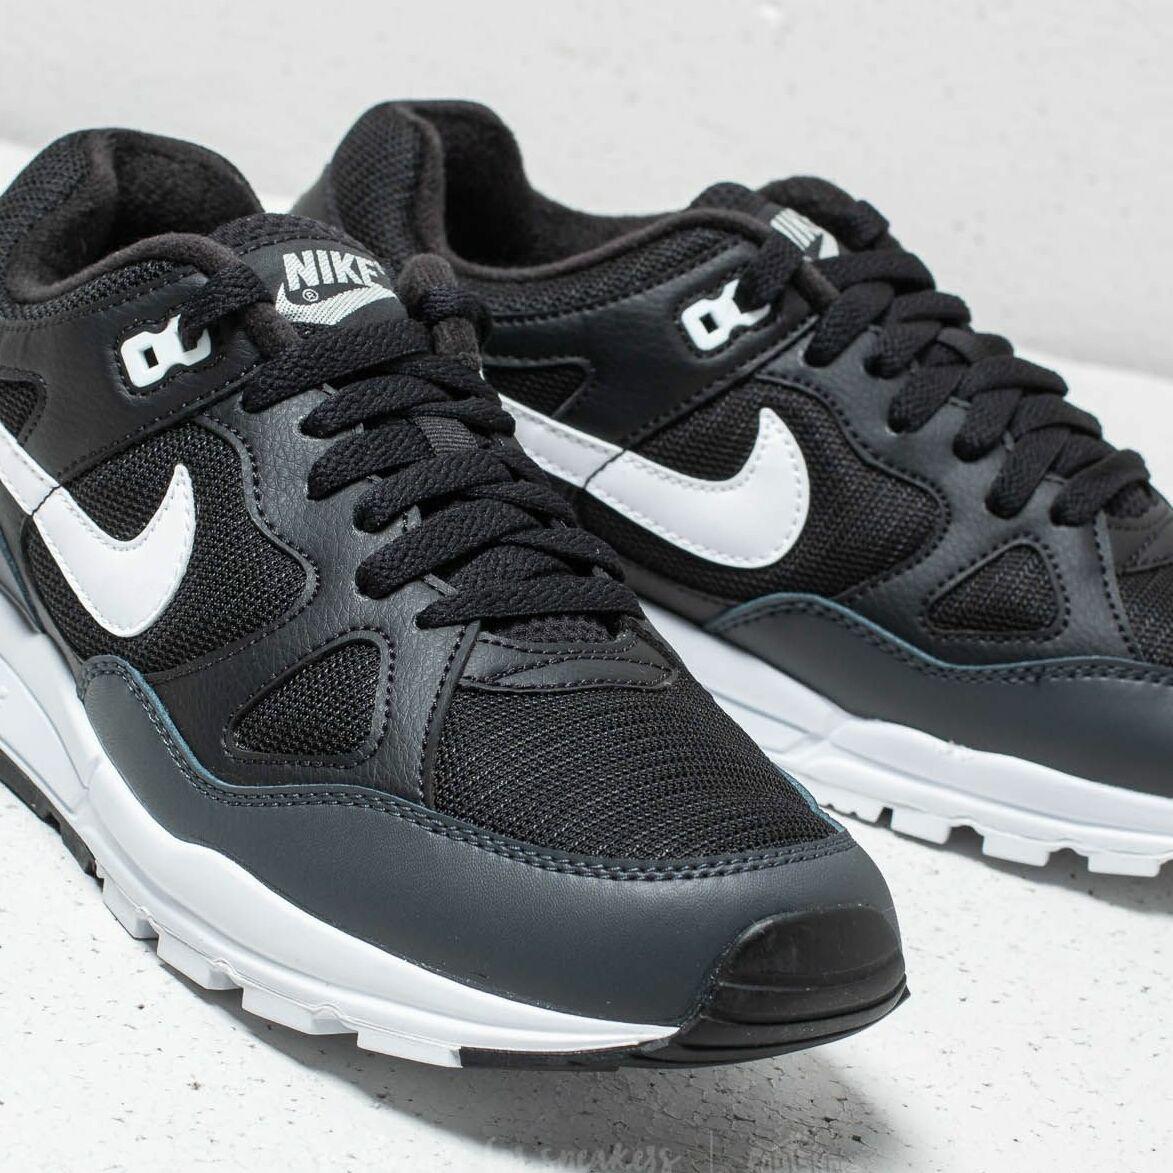 Nike Air Span II Black/ White-Anthracite